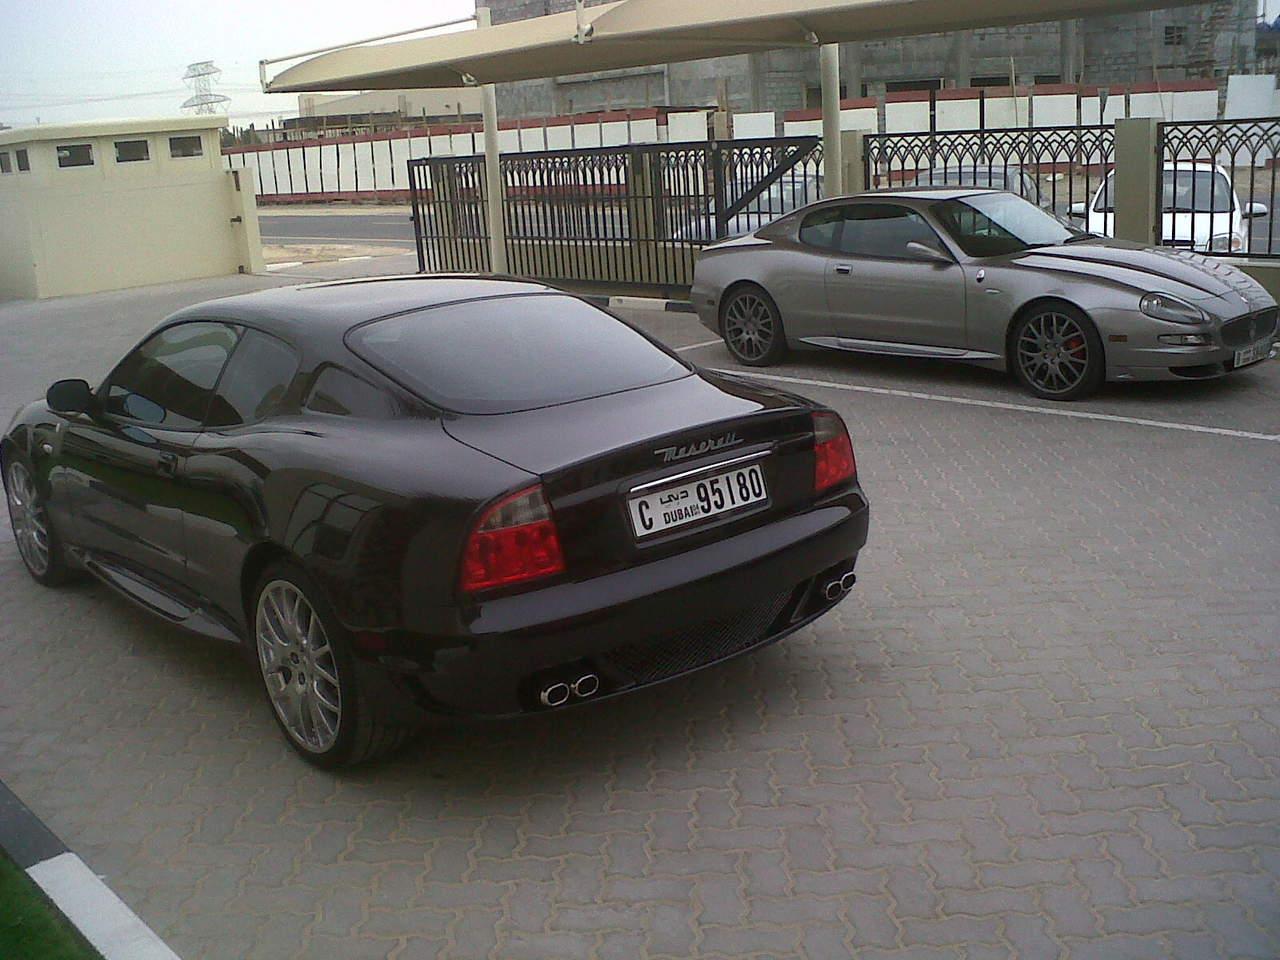 GS LE & MCV in Dubai-img01728-20120417-1601.jpg